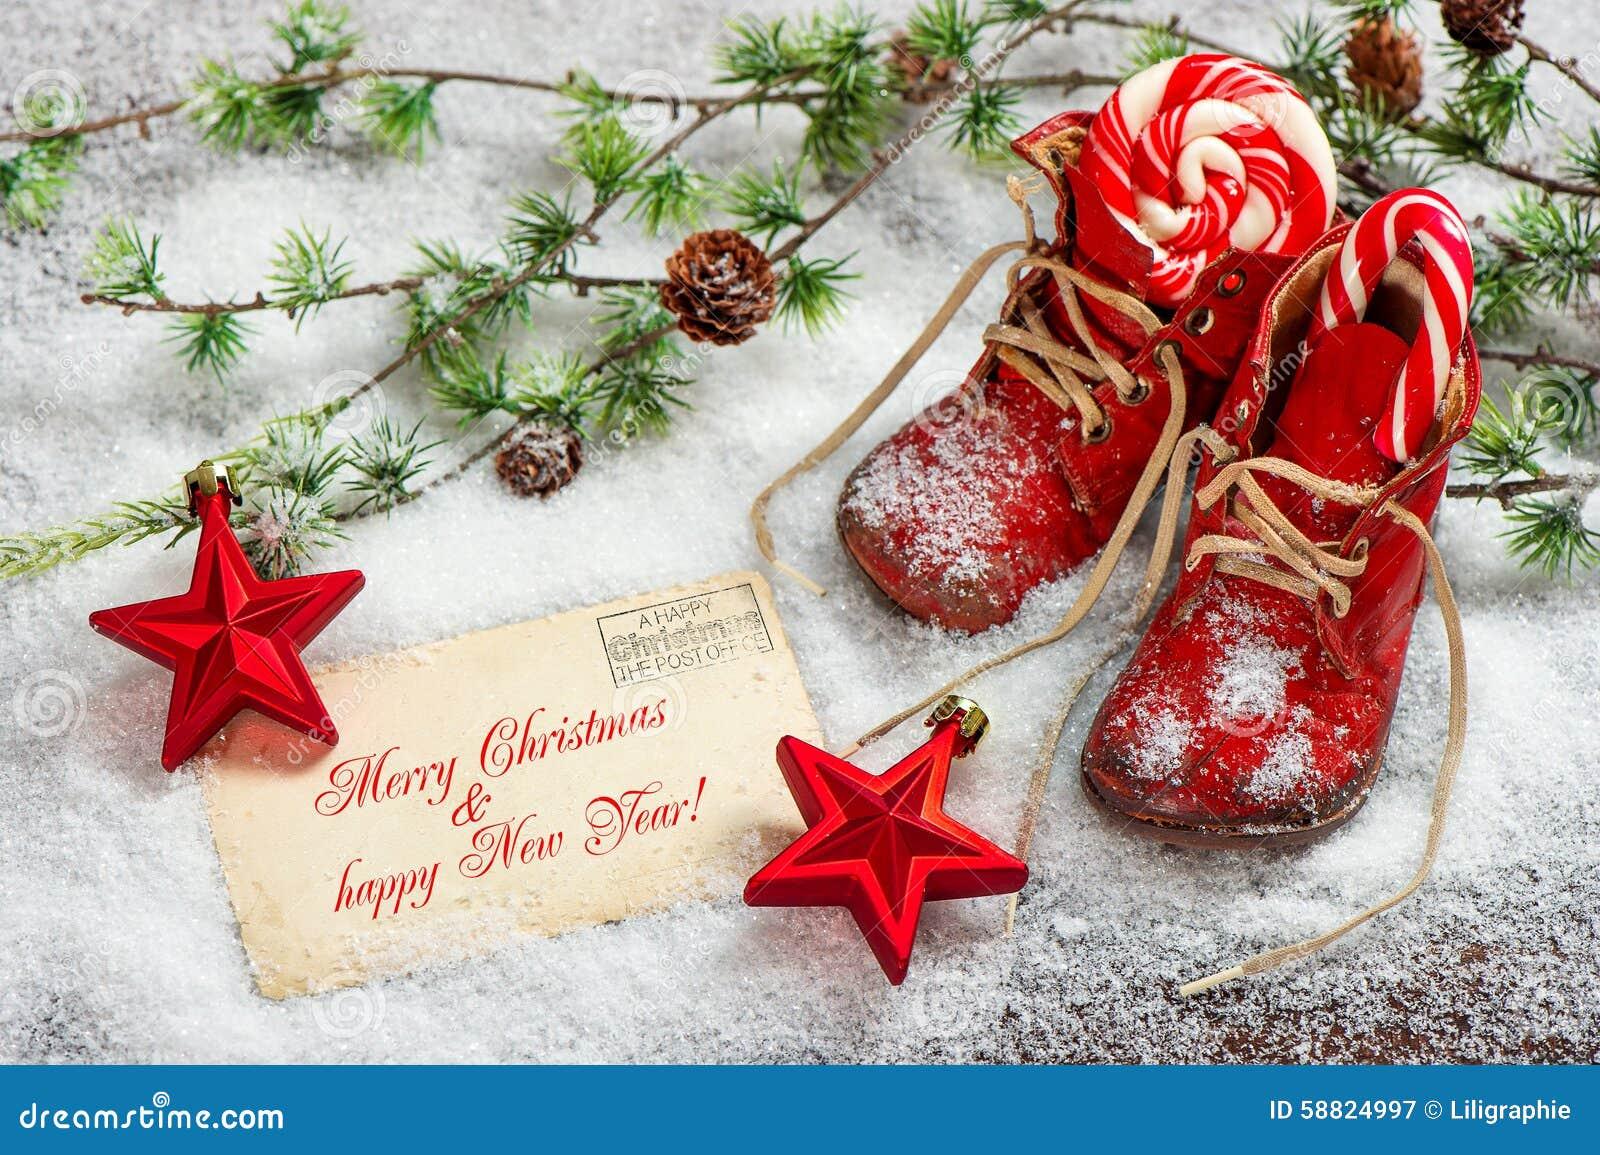 Red Christmas Shoes Lyrics